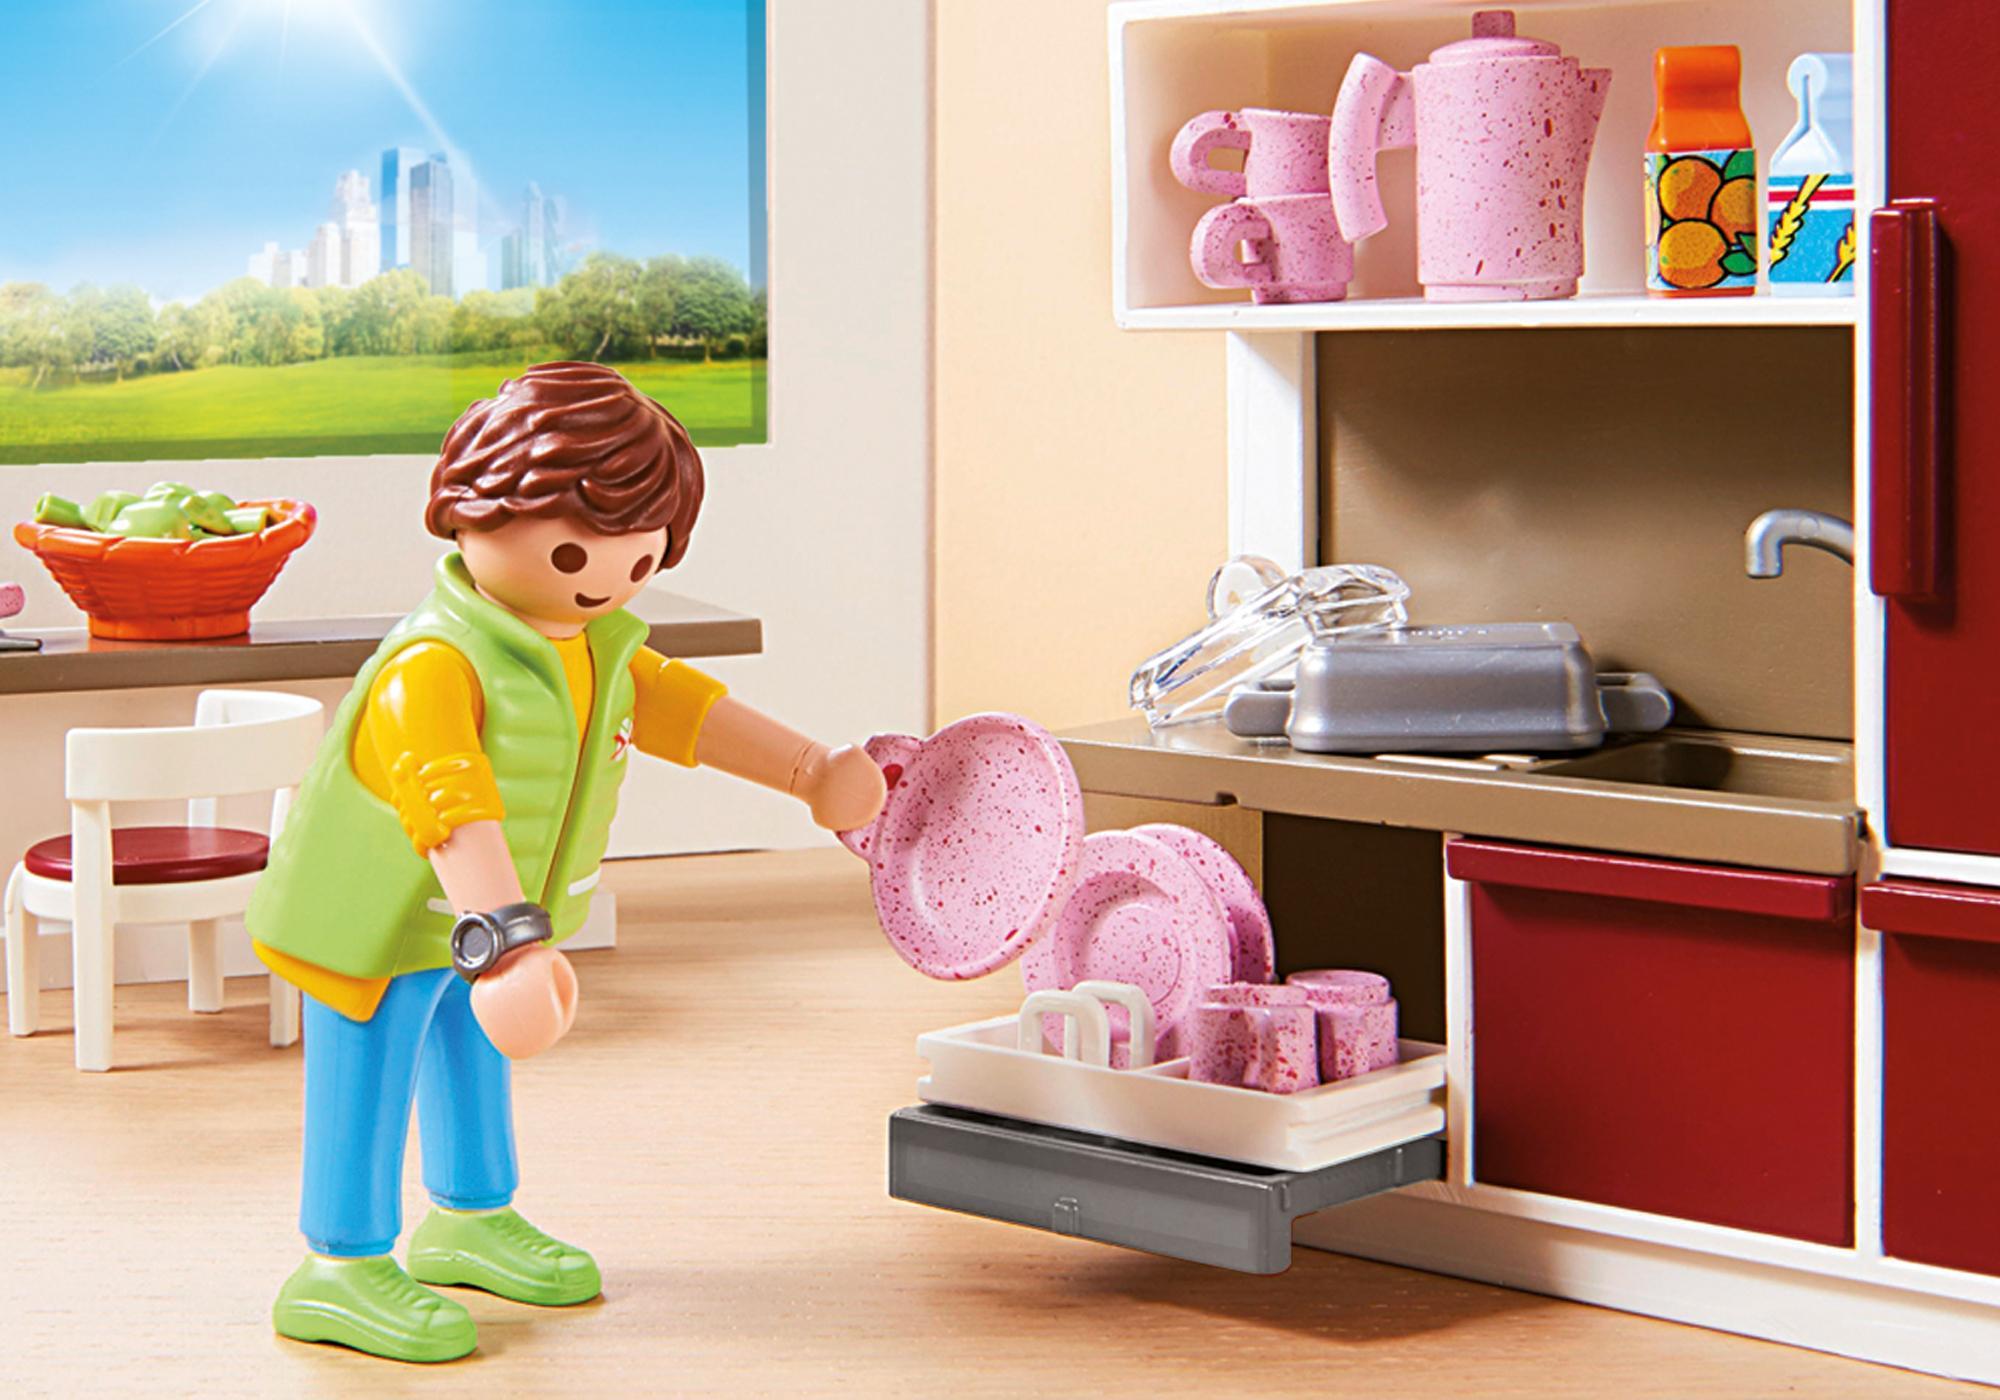 http://media.playmobil.com/i/playmobil/9269_product_extra2/Grande cucina attrezzata